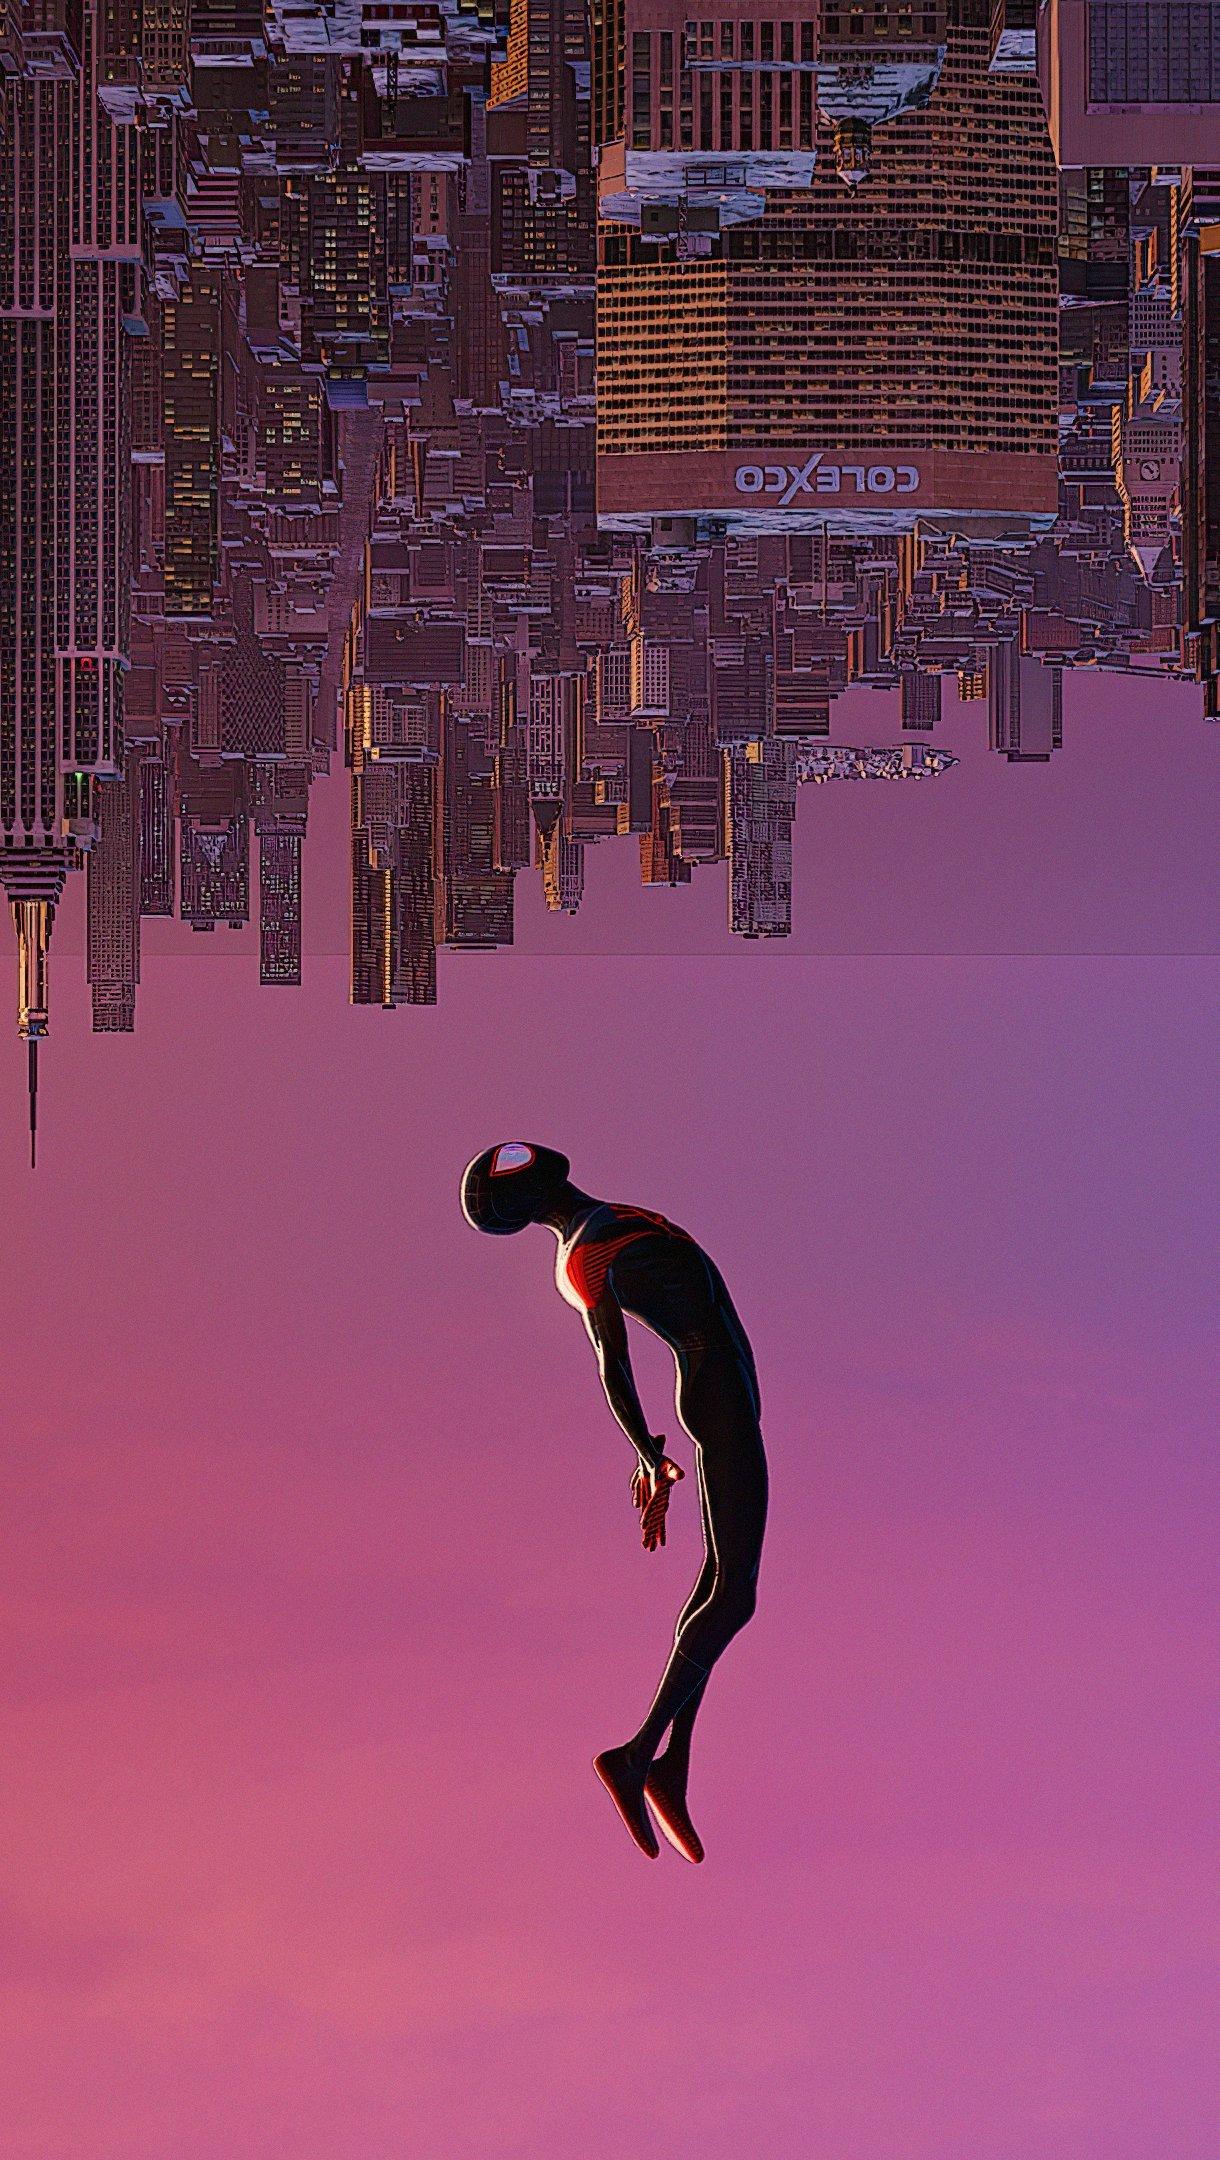 Wallpaper Spiderman upside down Vertical